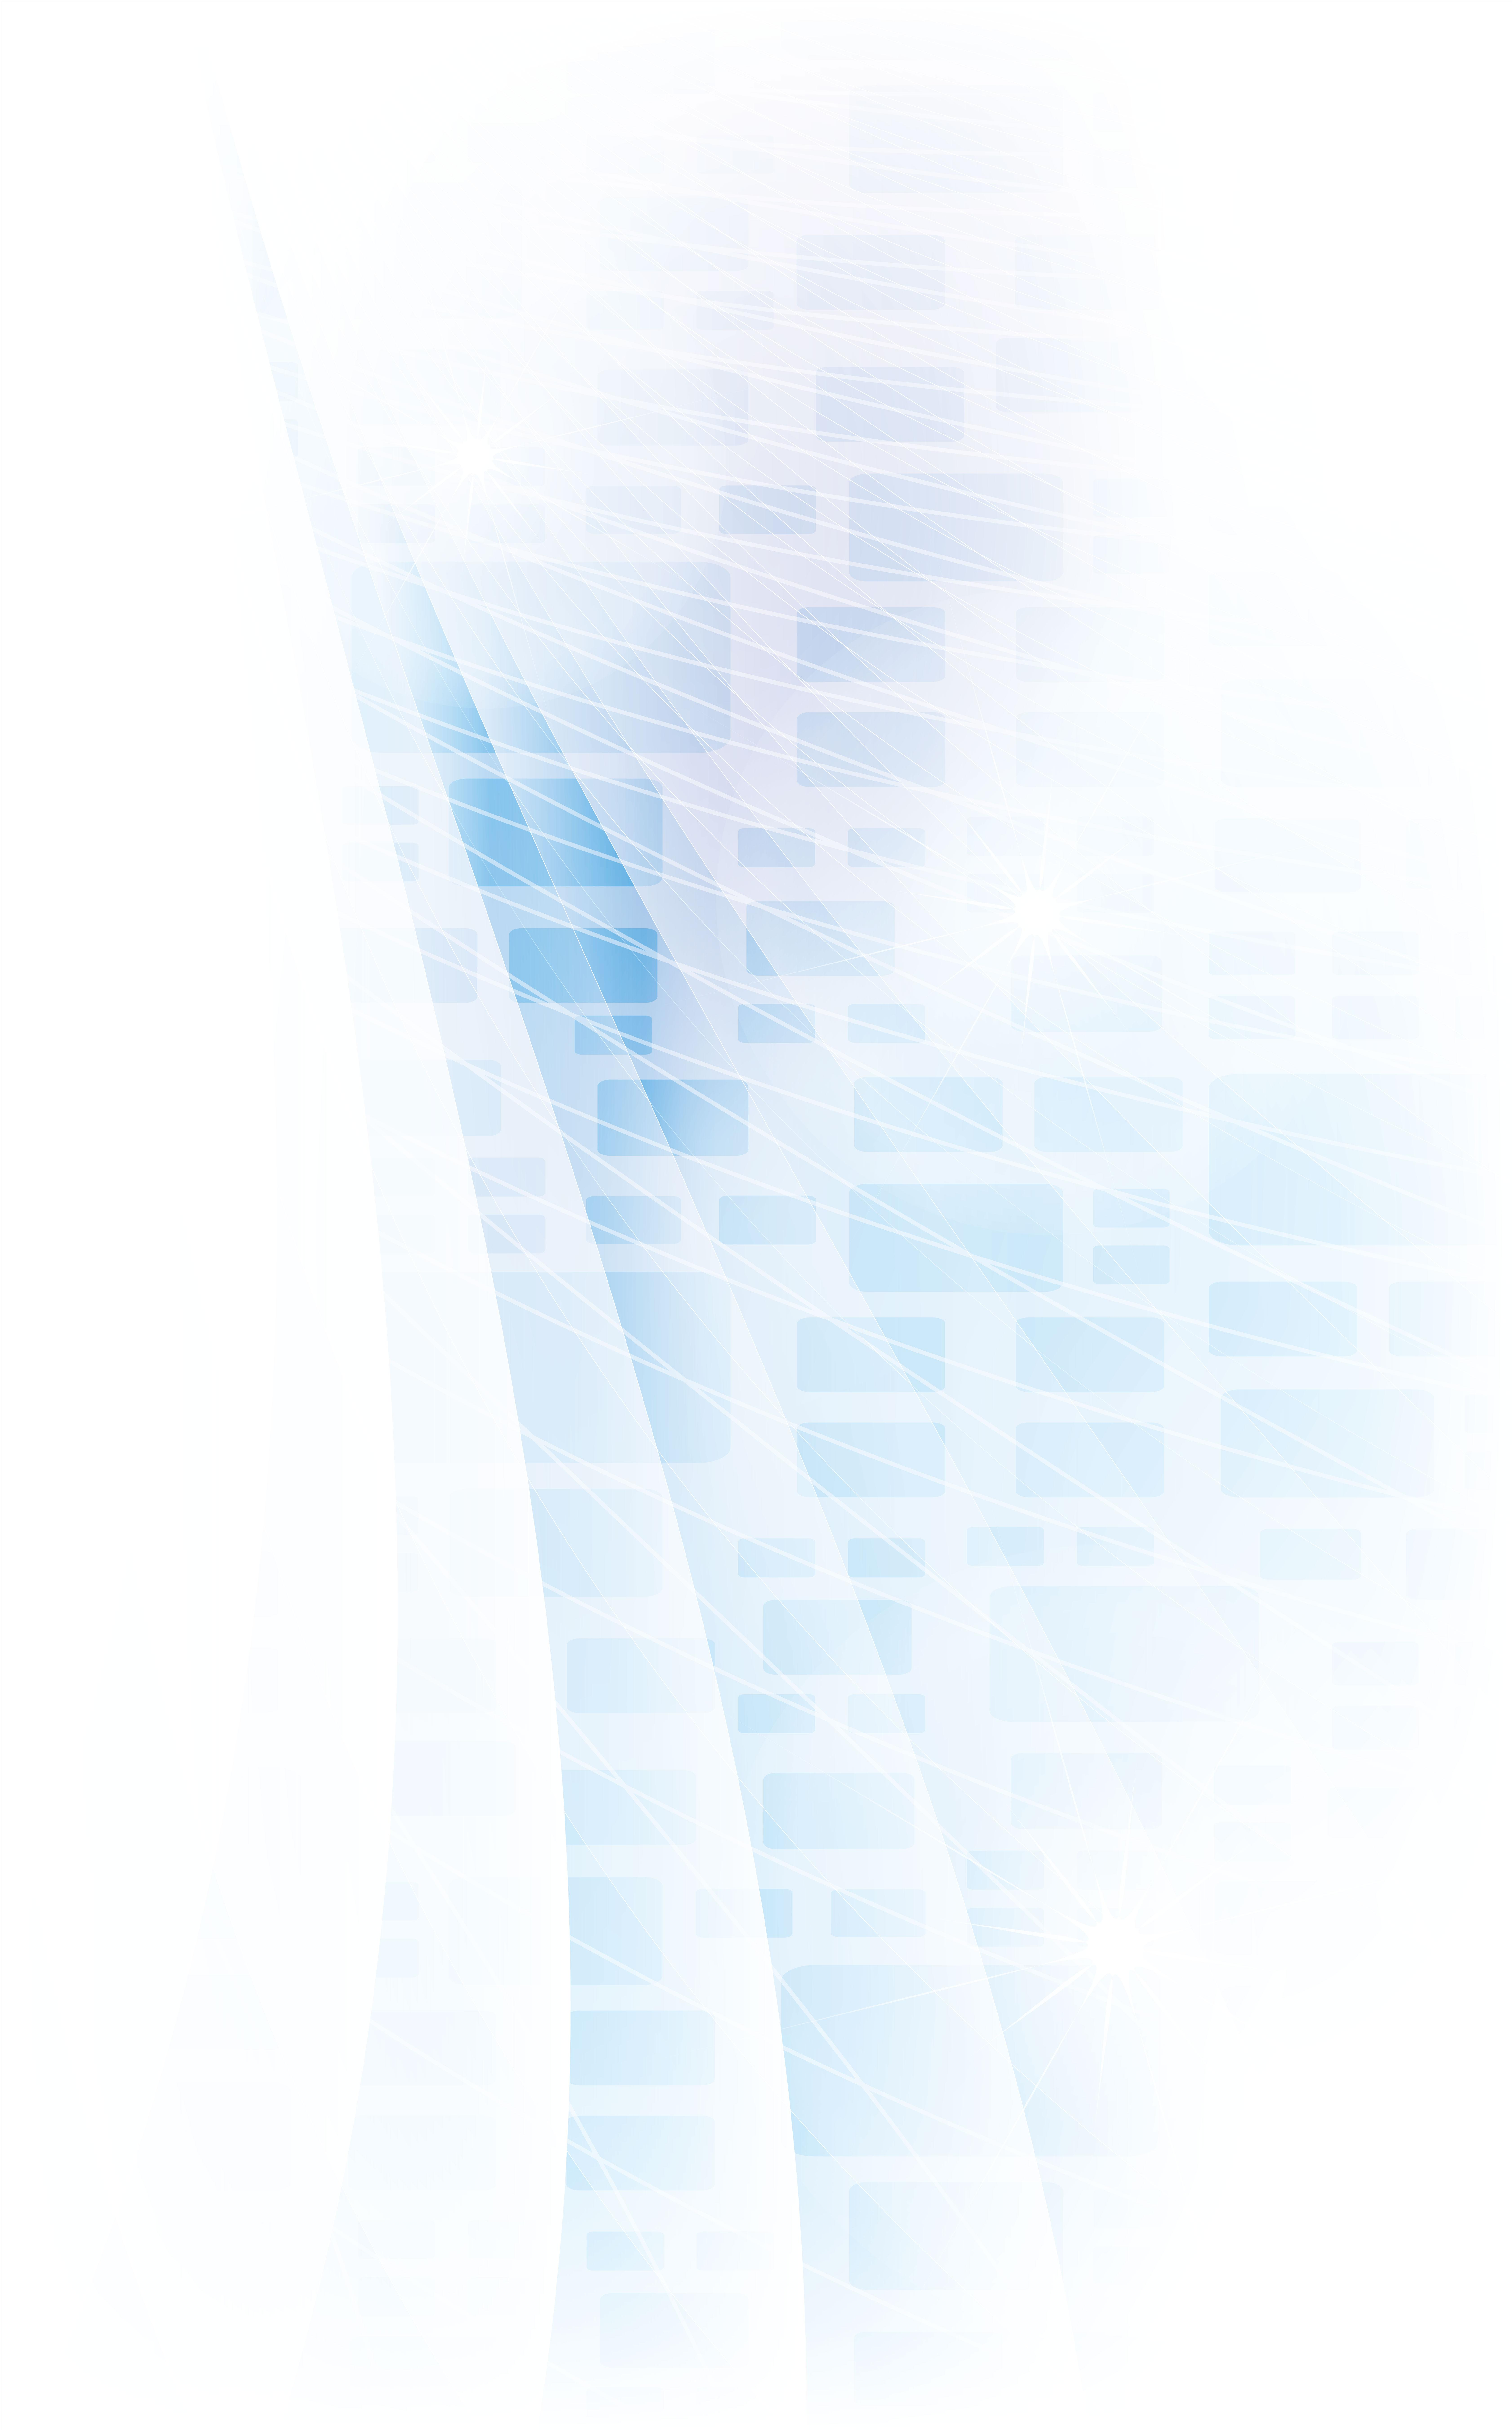 wallpaper digital design art background  creative  light